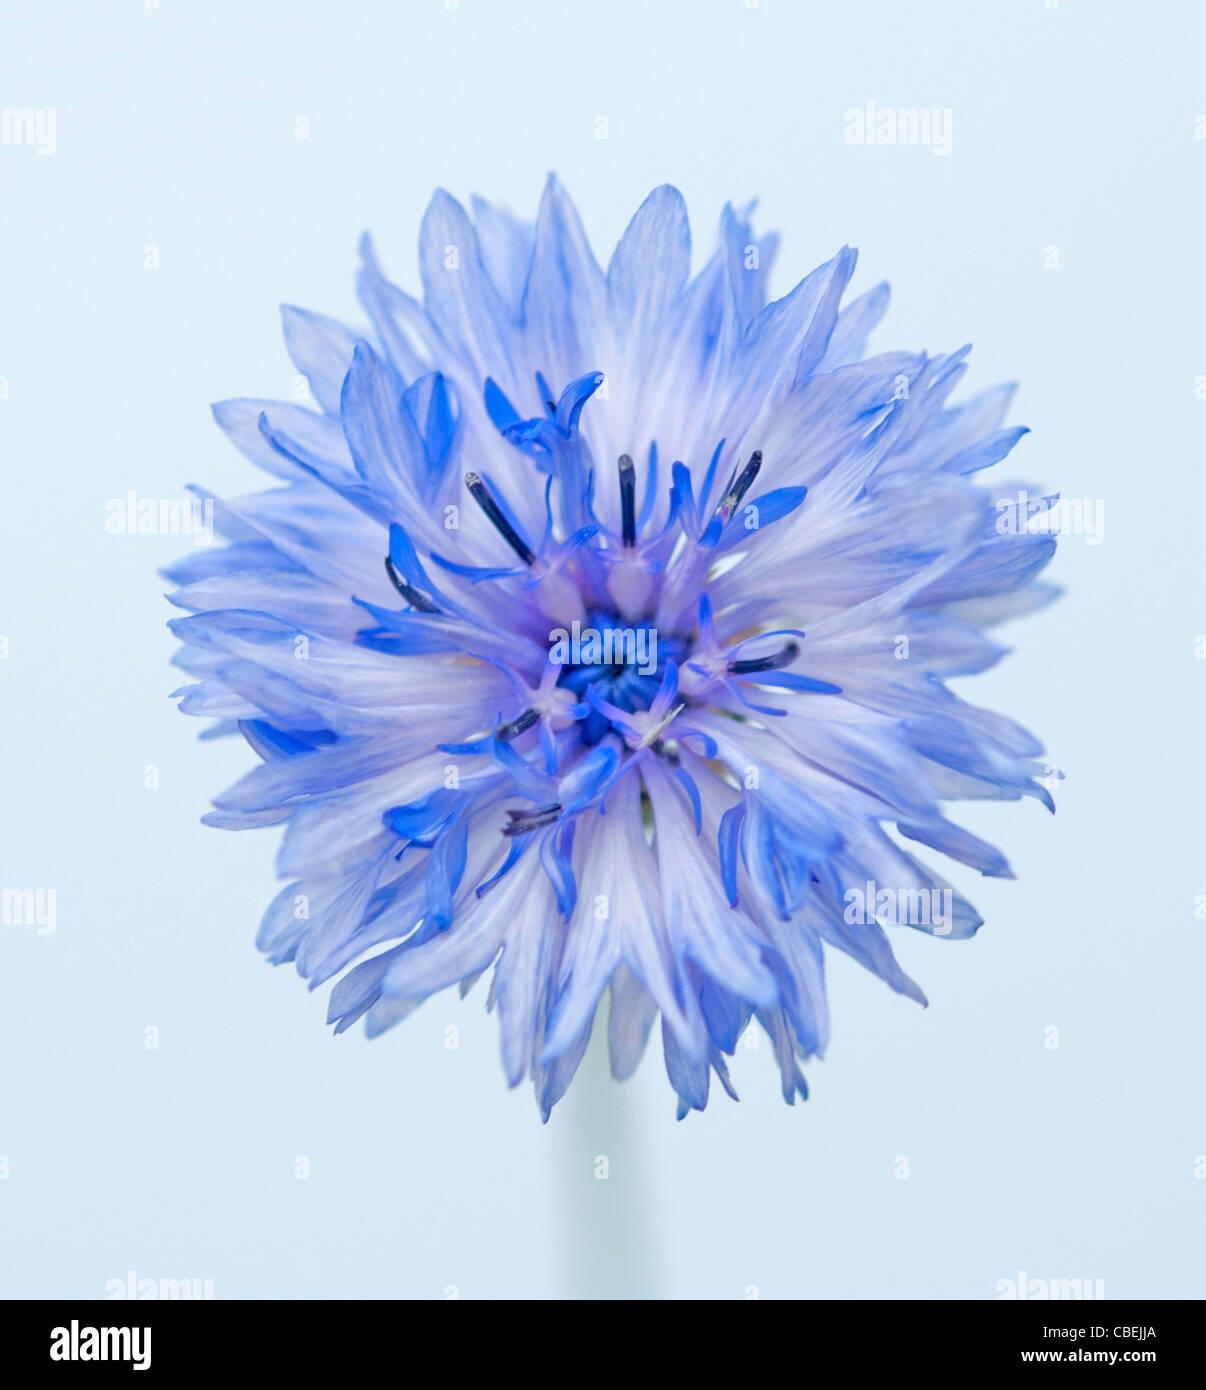 Centaurea Cyanus Cornflower Blue Flower Subject Blue Background Stock Photo Royalty Free